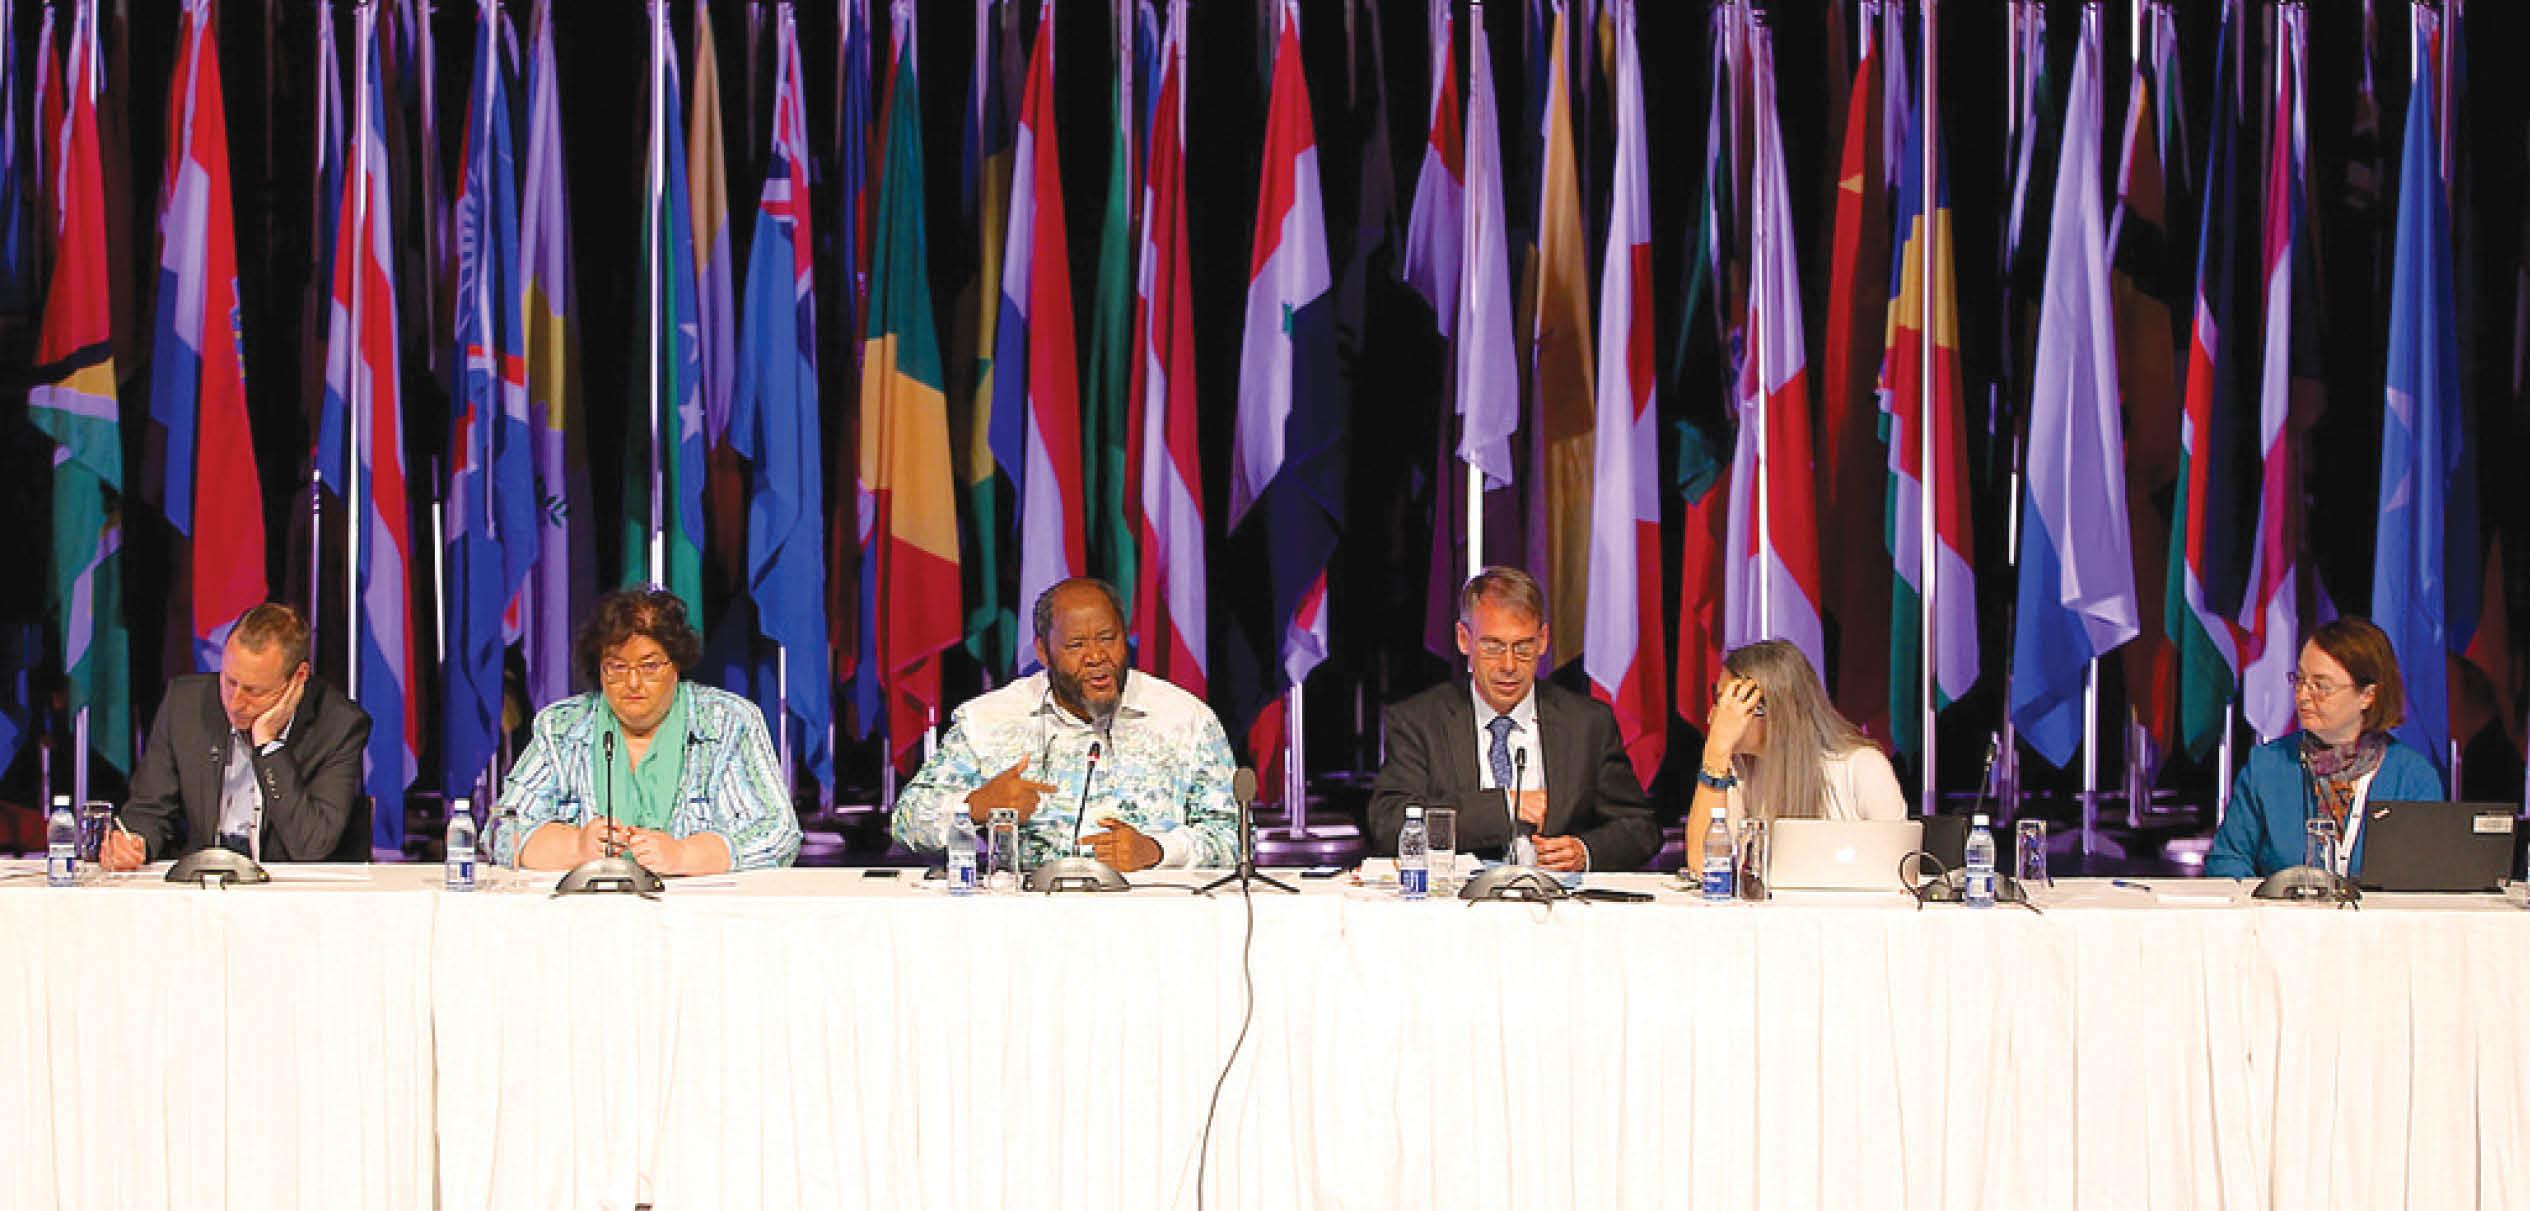 UN World Data Forum considering role of data, statistics for SDG implementation